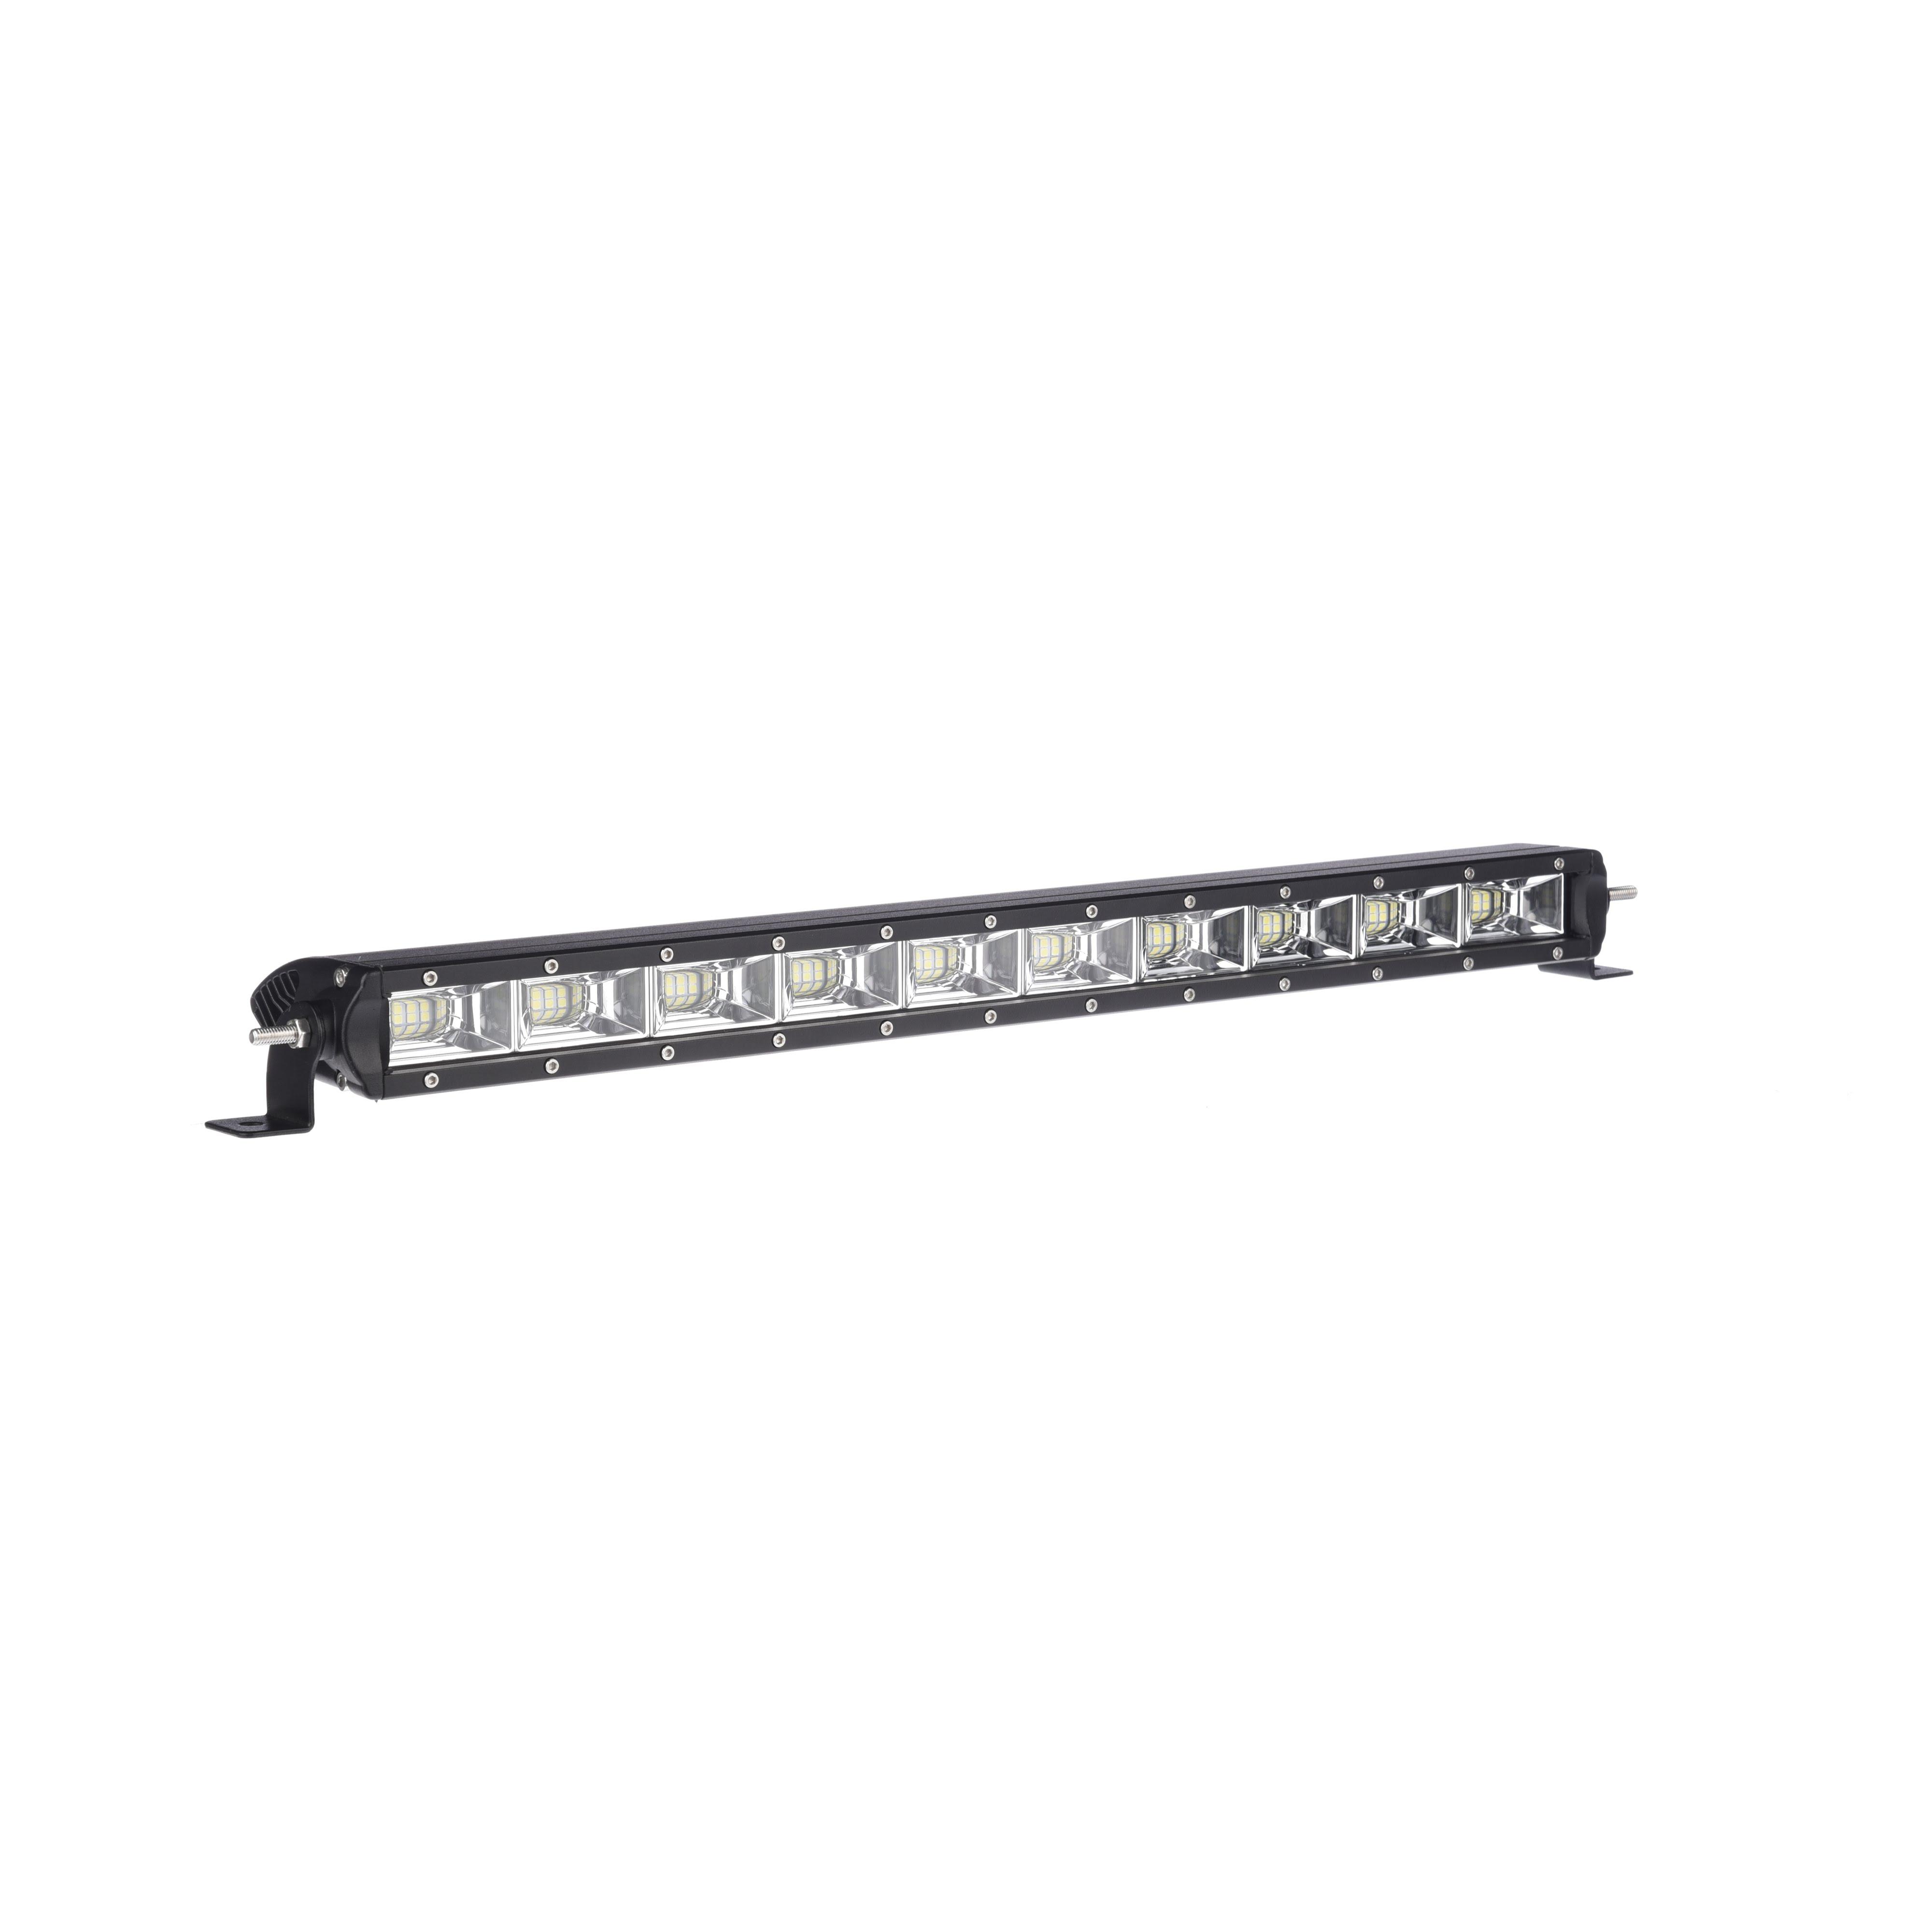 "SHARK LED Light Bar 21,5"", ETI LED, 100W"